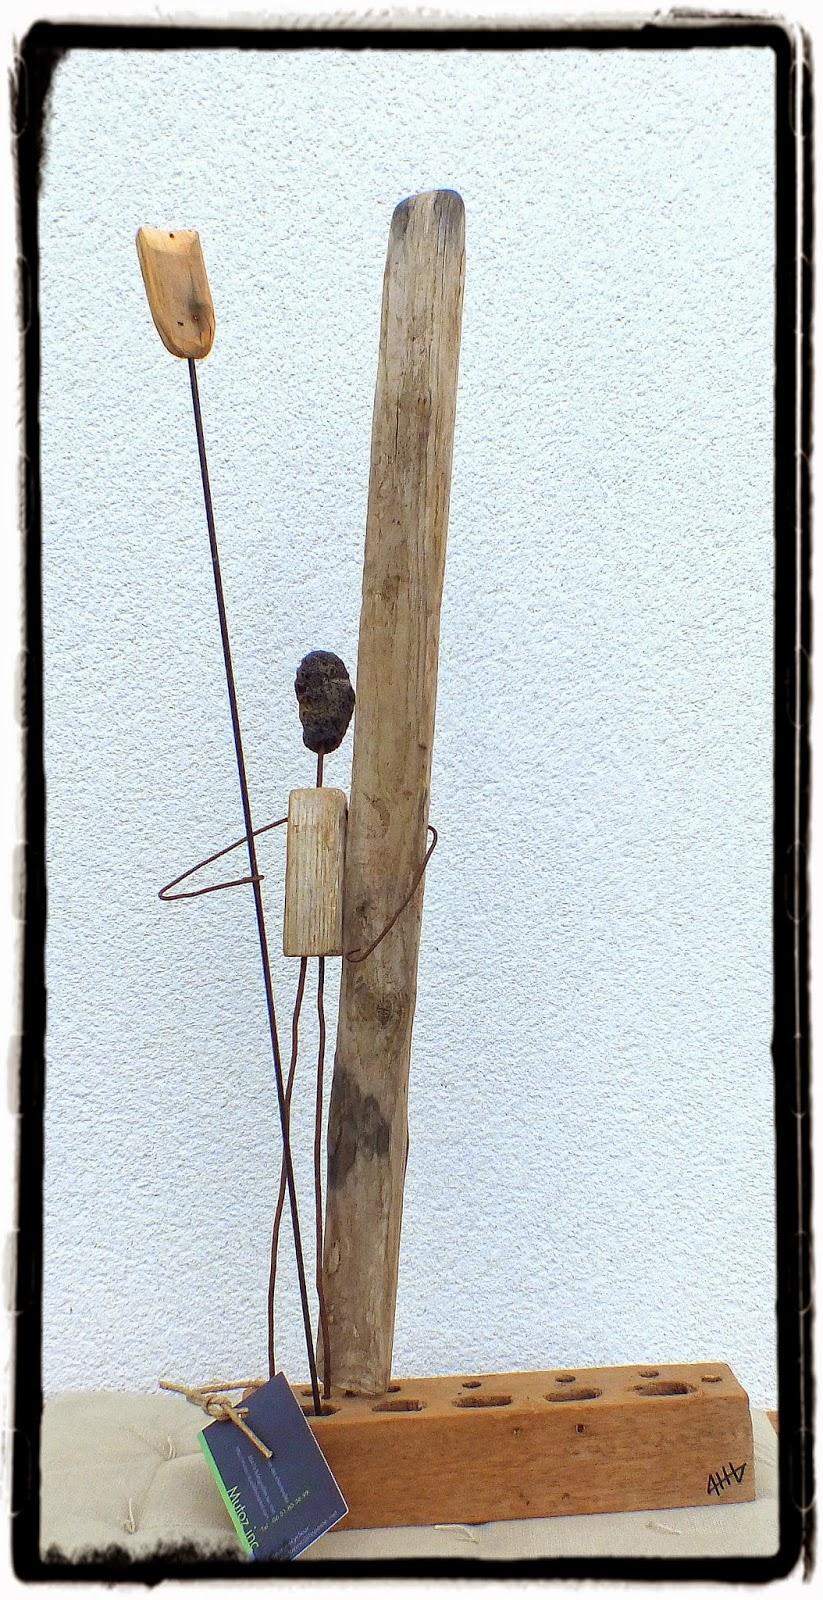 Get up stand up statue en bois flott mutoz inc art for Bois flotte sculpture